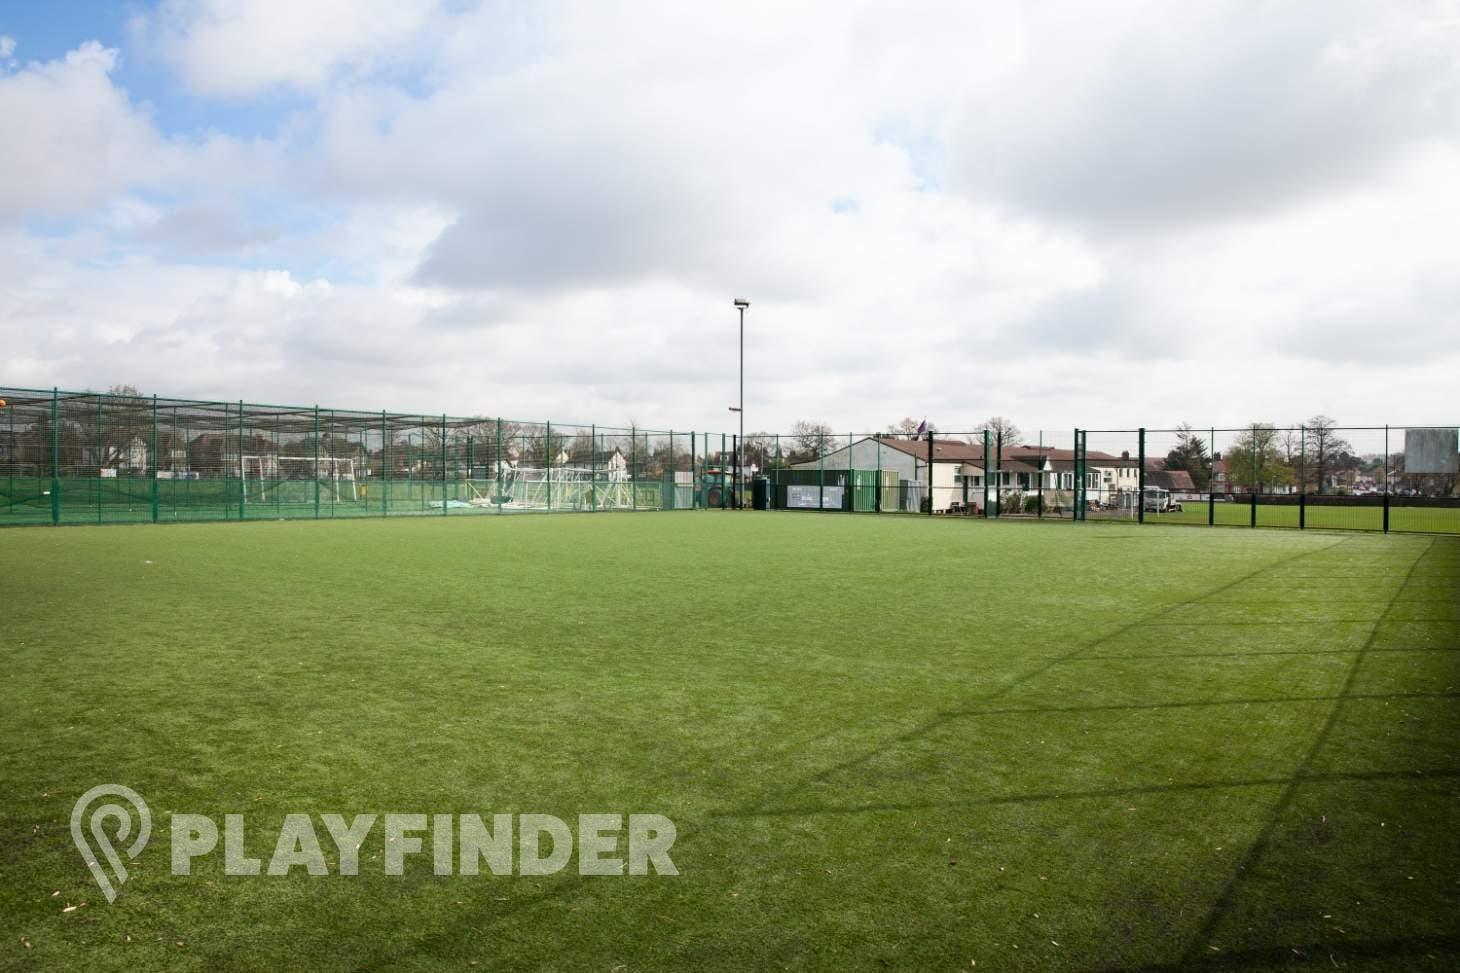 Winchmore Hill Sports Club 5 a side   3G Astroturf football pitch